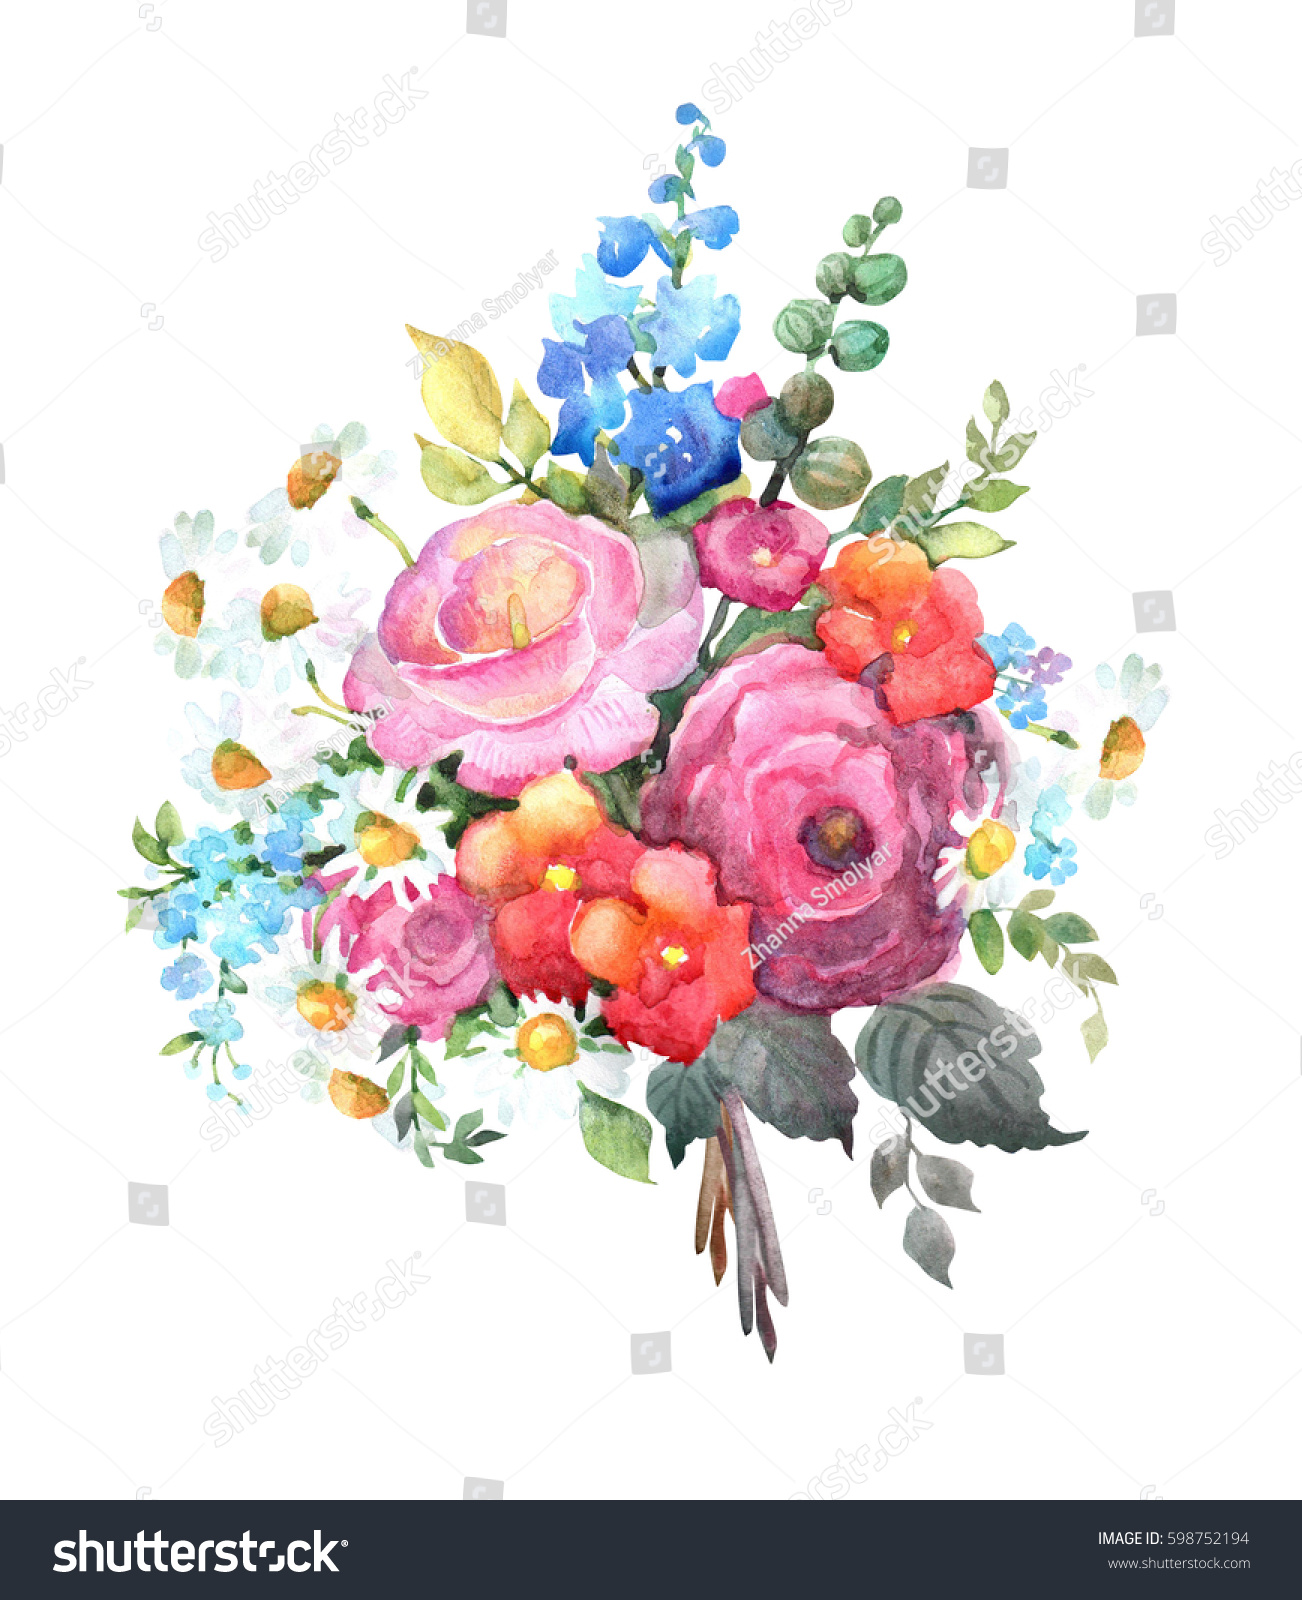 Rose /& Delphinium Hand Painted Watercolour Spring Flower Clipart